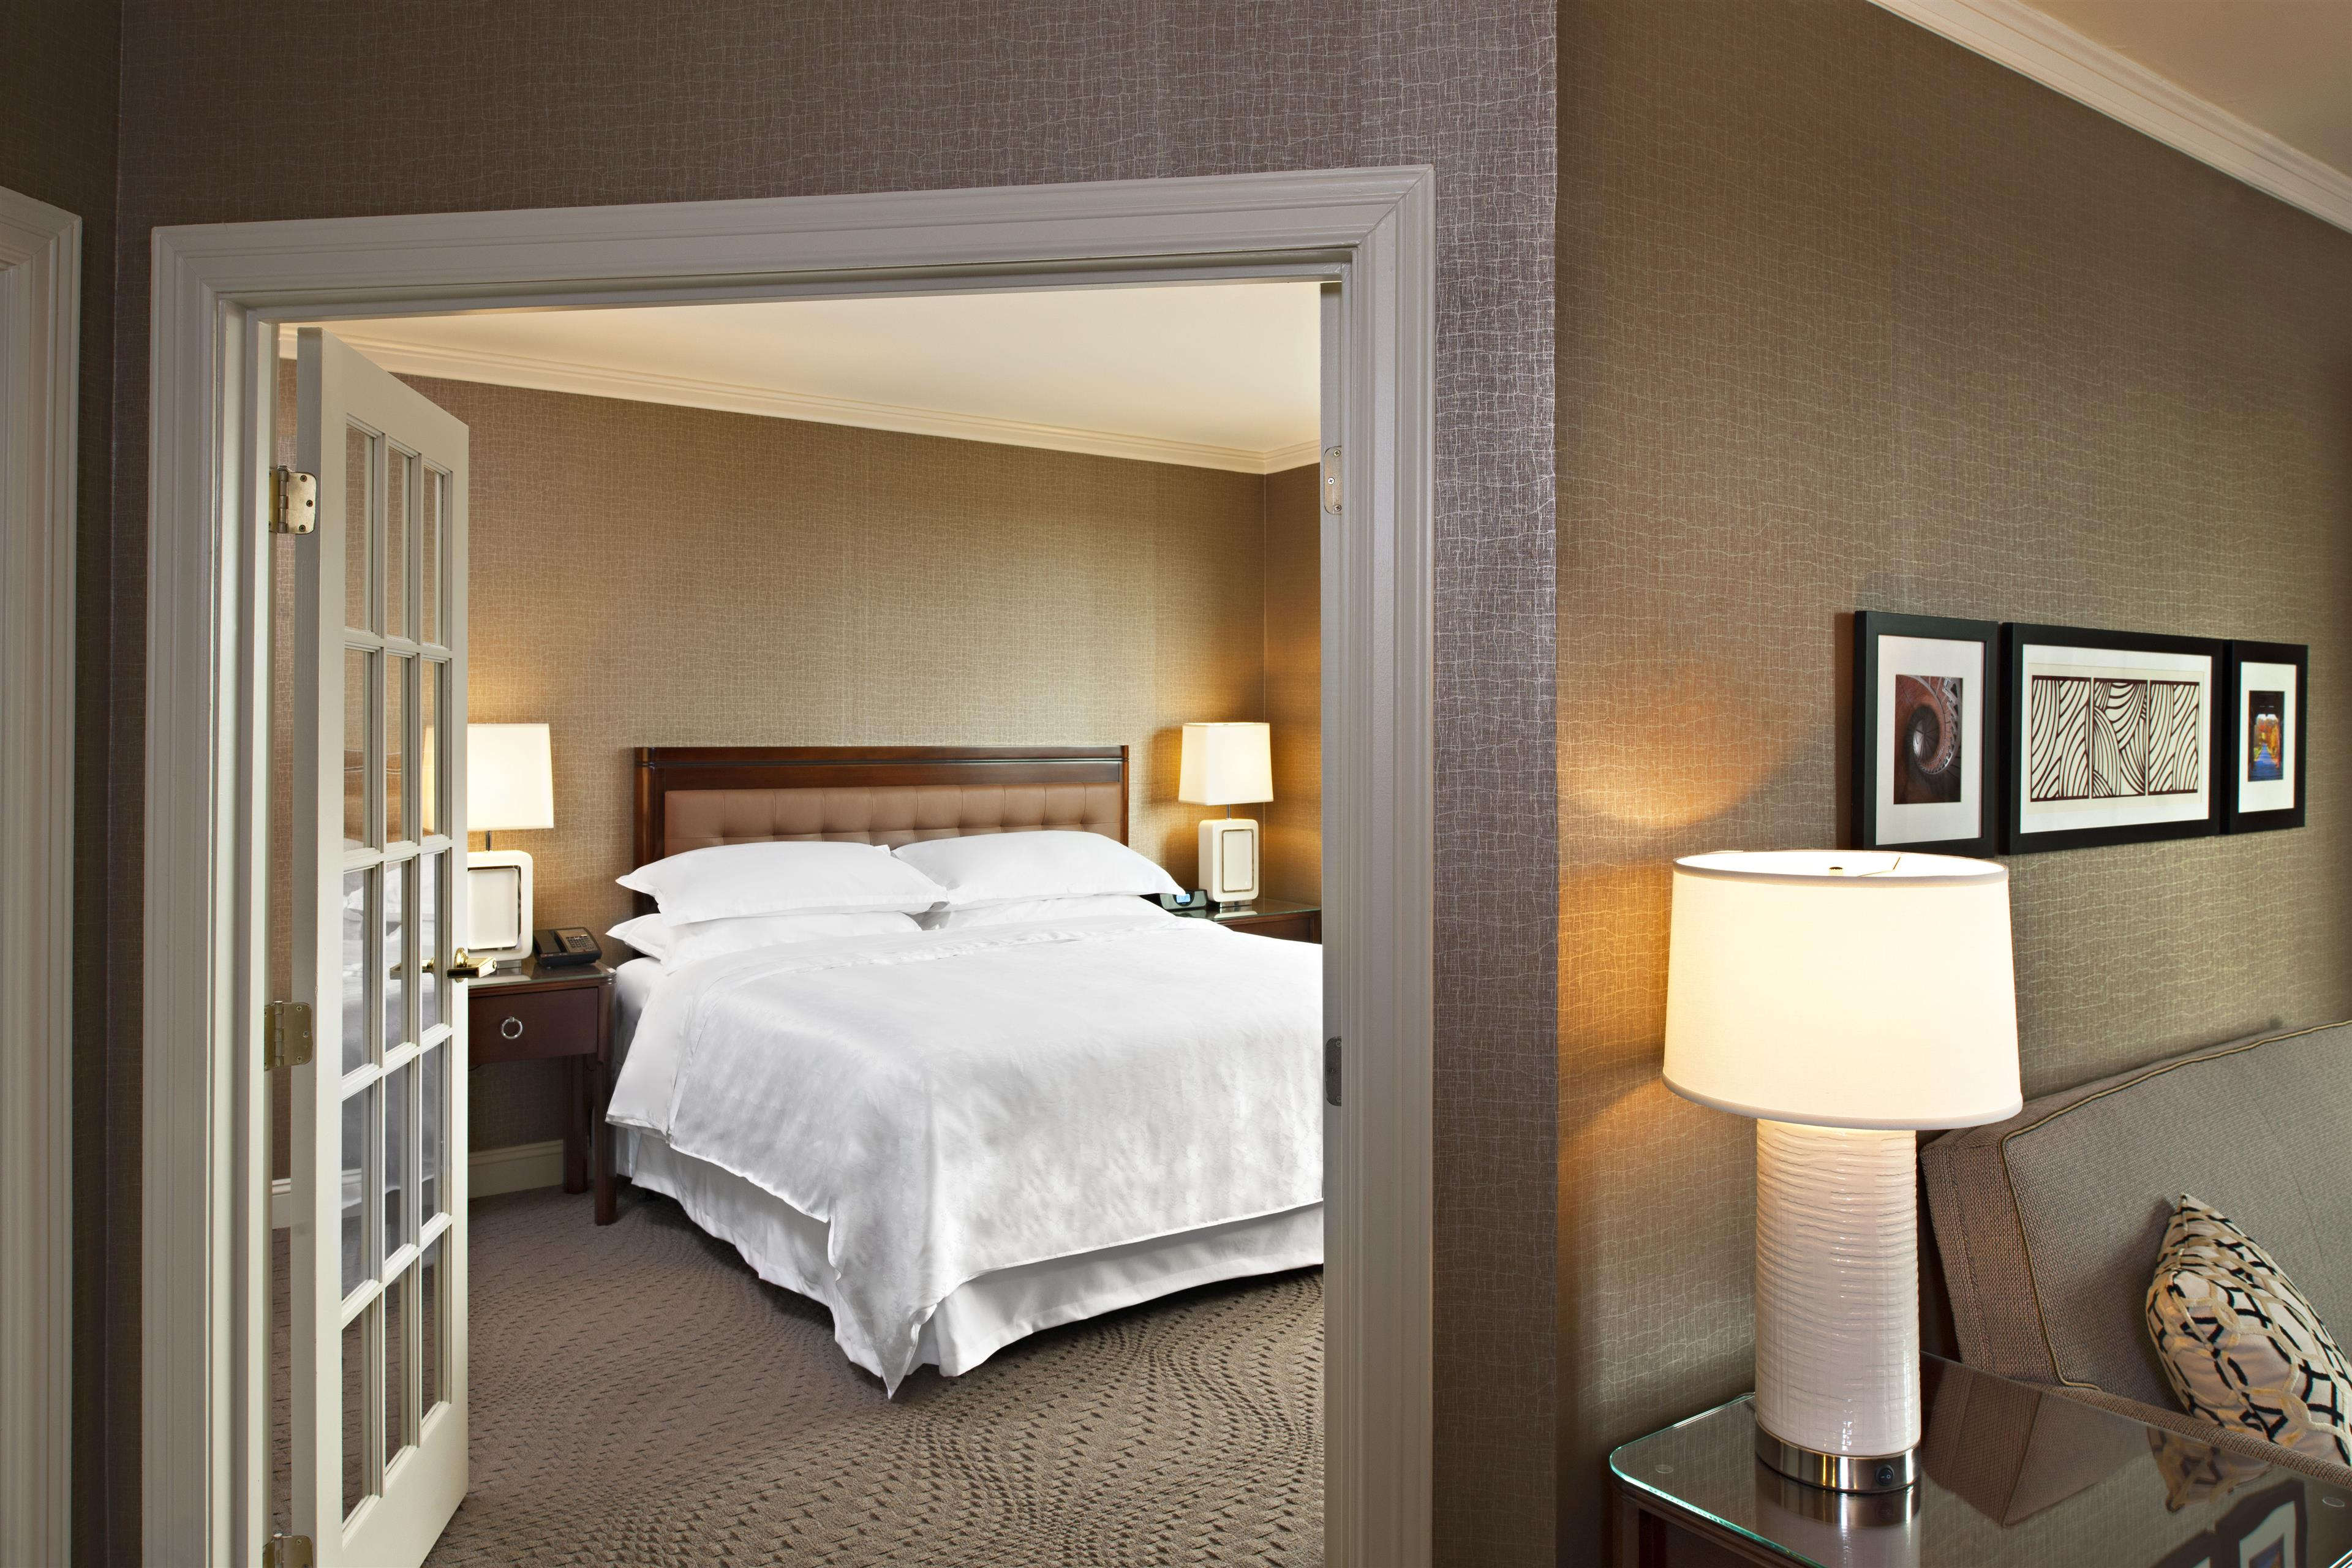 Sheraton Wilmington South Hotel image 13